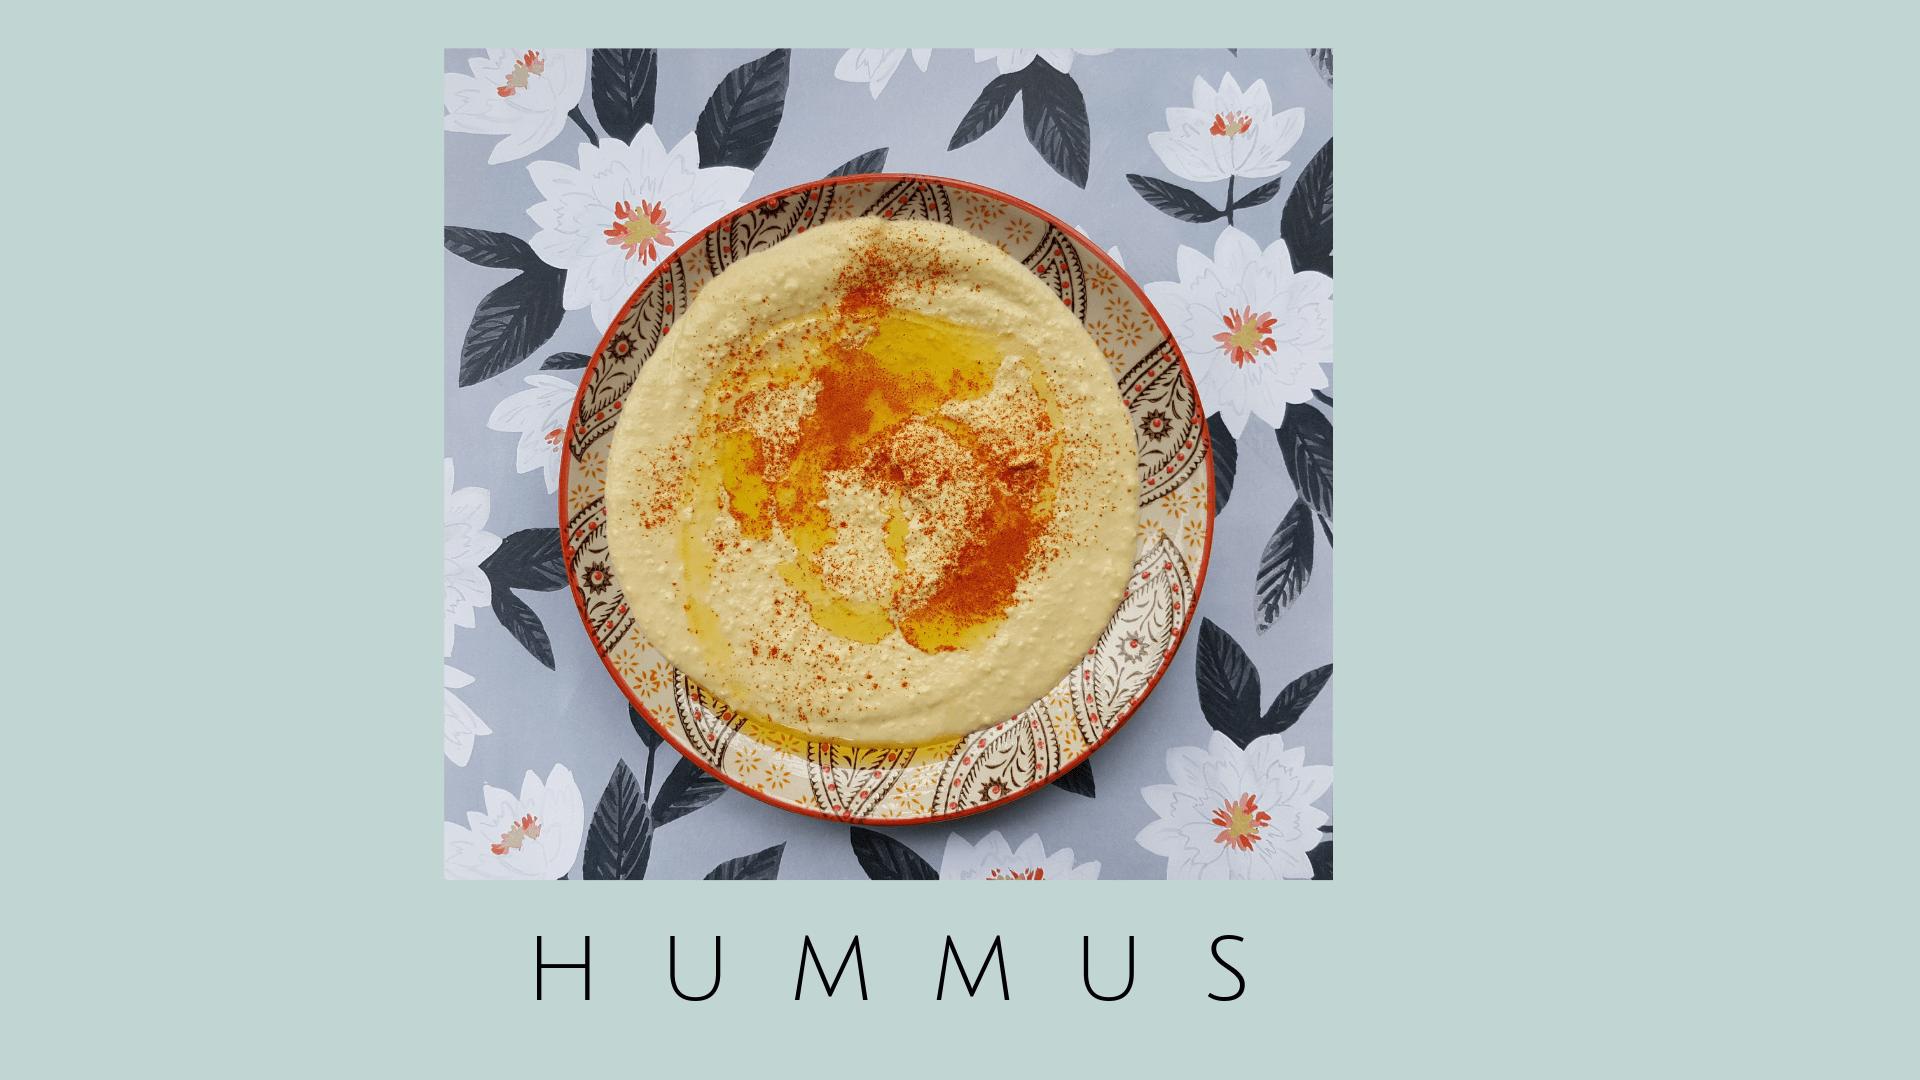 Hummus Receta fácil